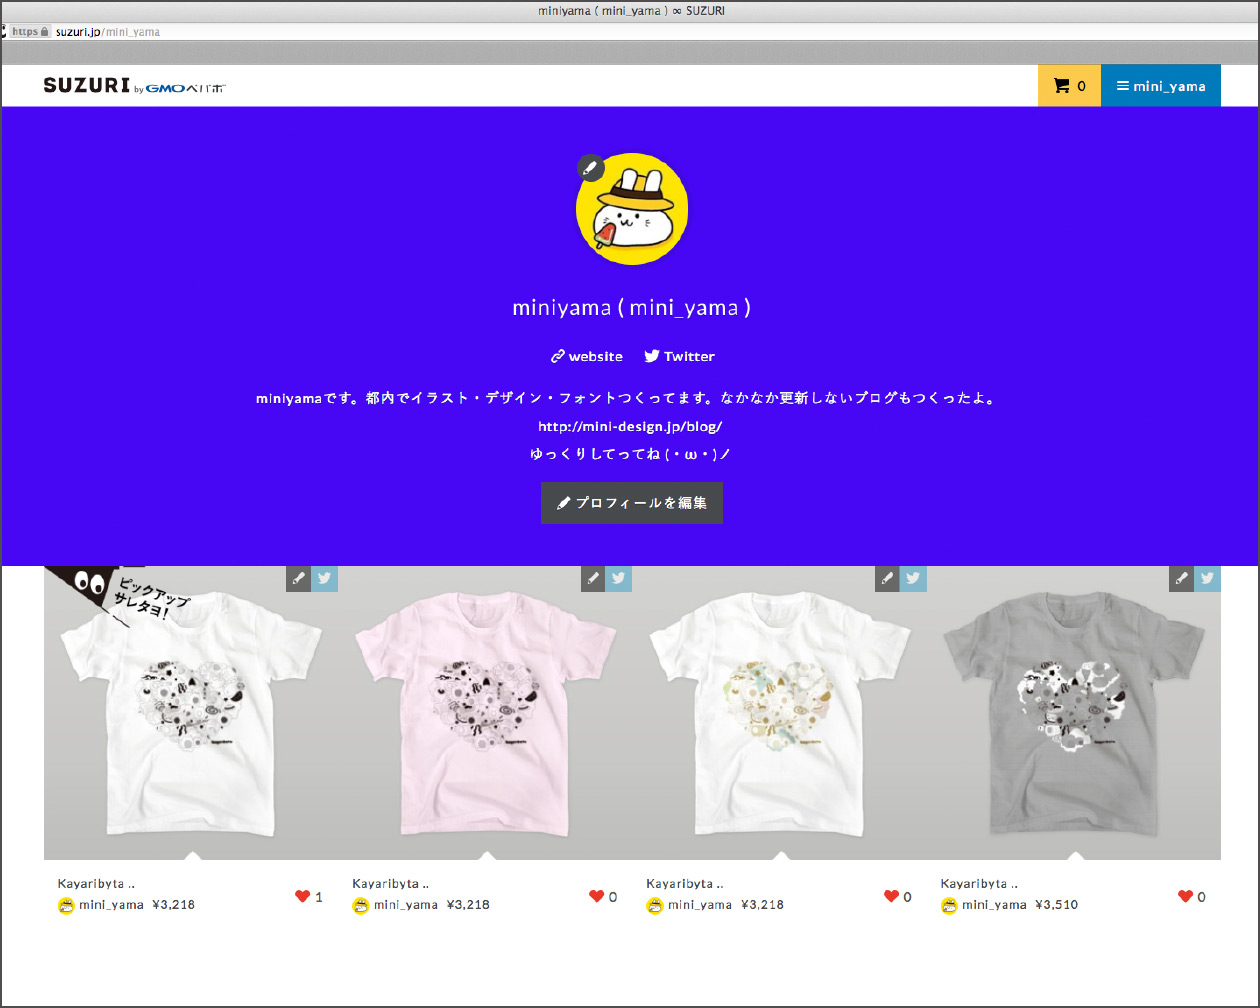 KayaributaのTシャツ SUZURIで4種類できた